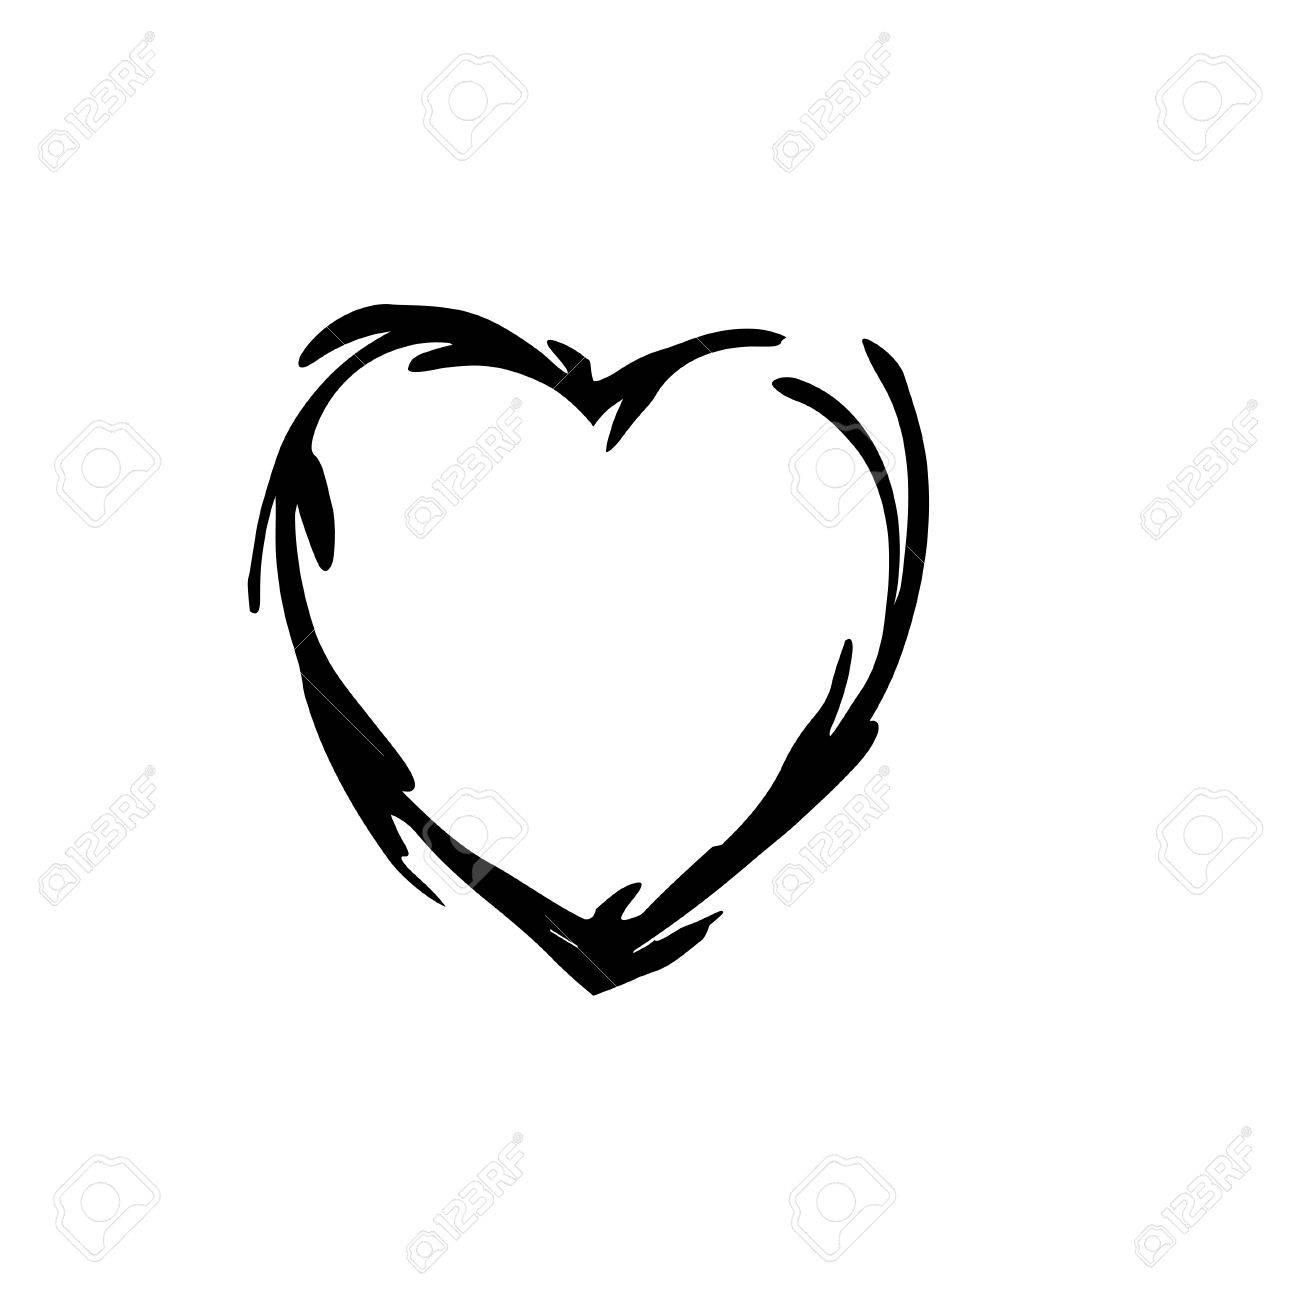 1300x1300 Heart Shape Symbol Love Vector Black. Heart Symbol Wedding